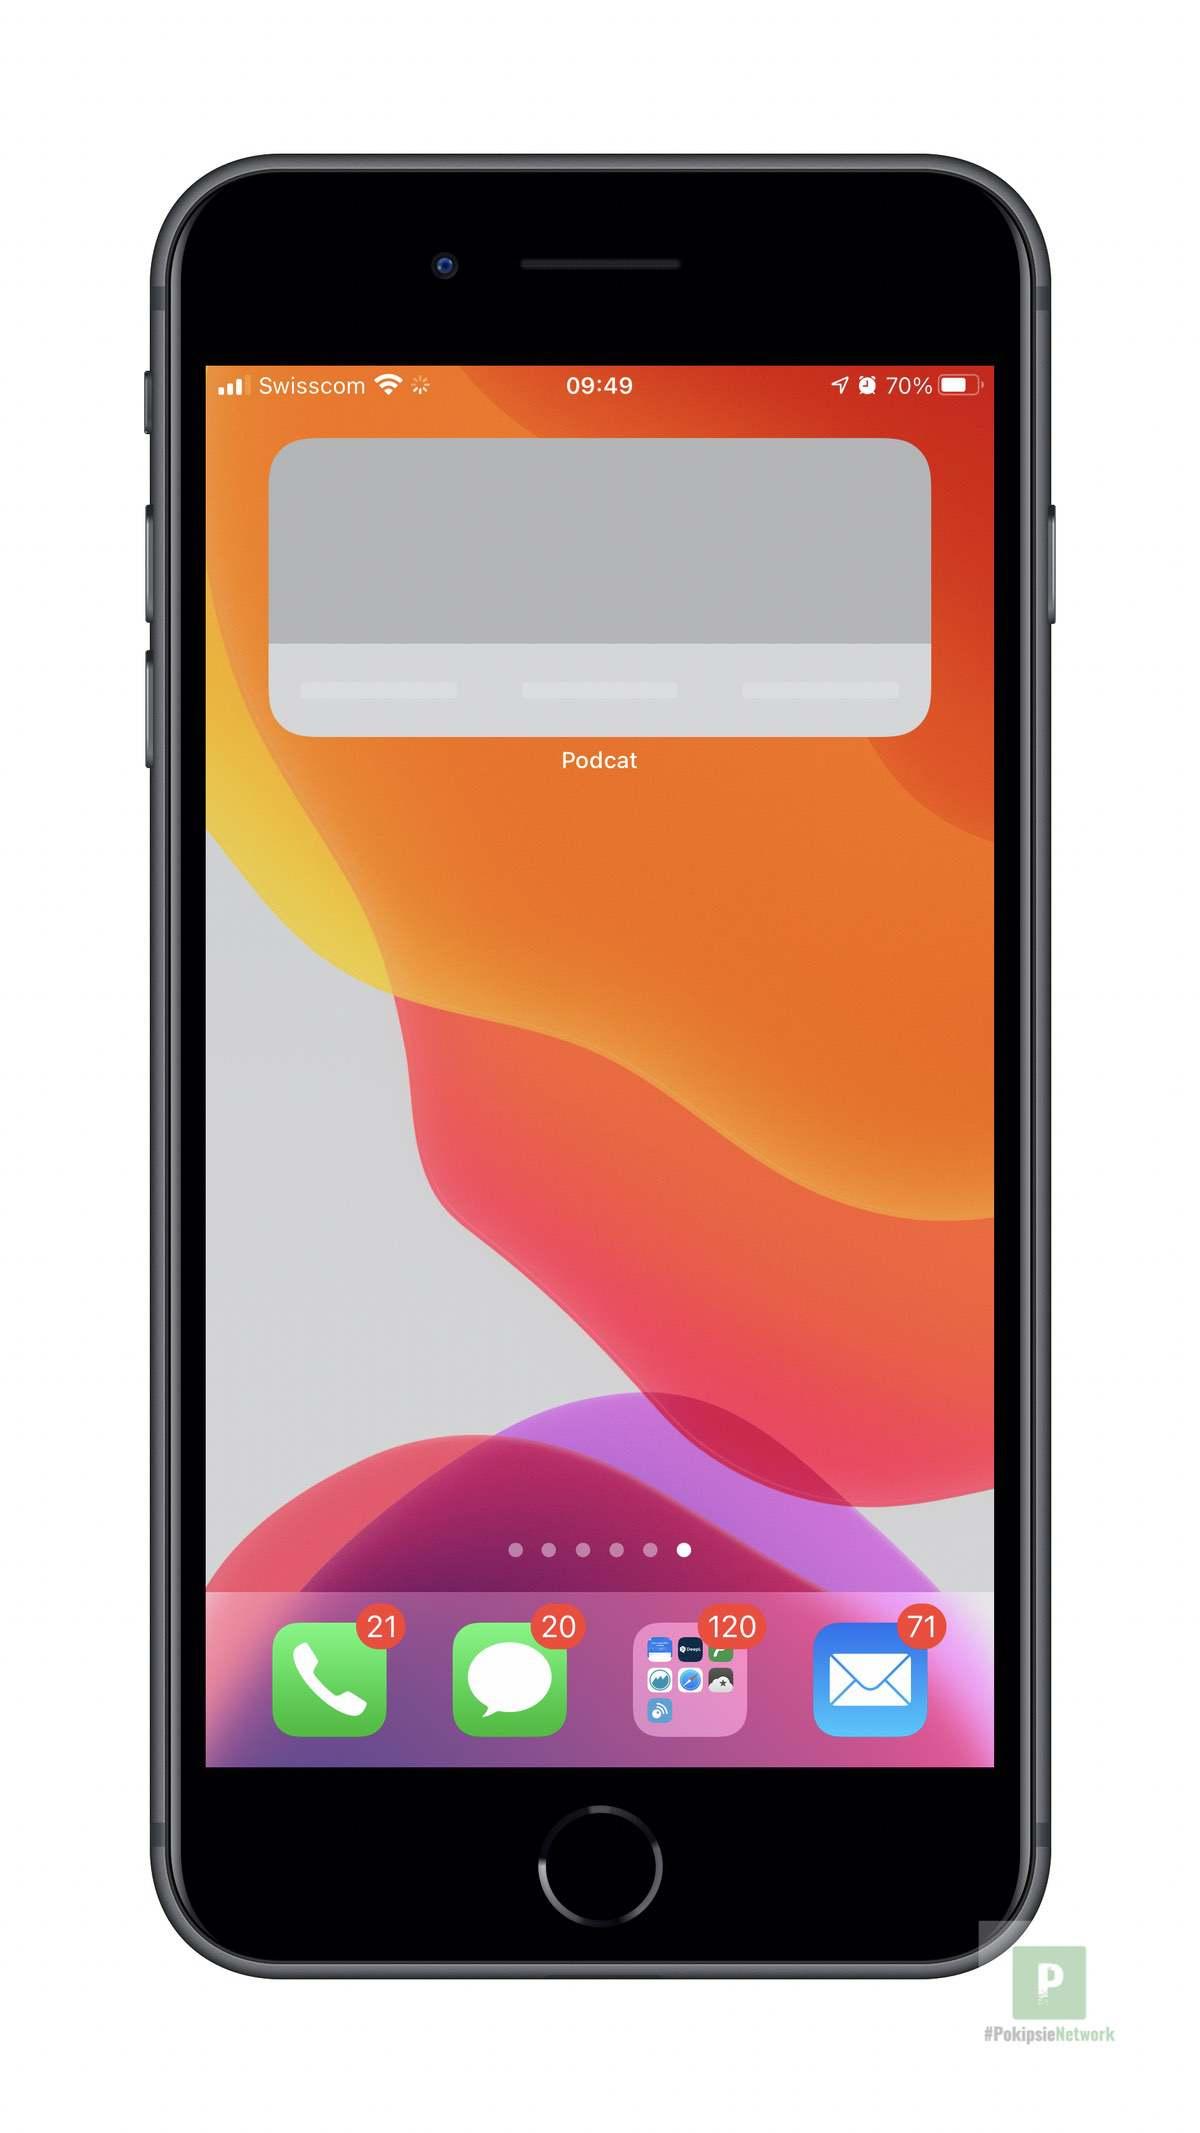 Podcat - iOS Widget Mittel